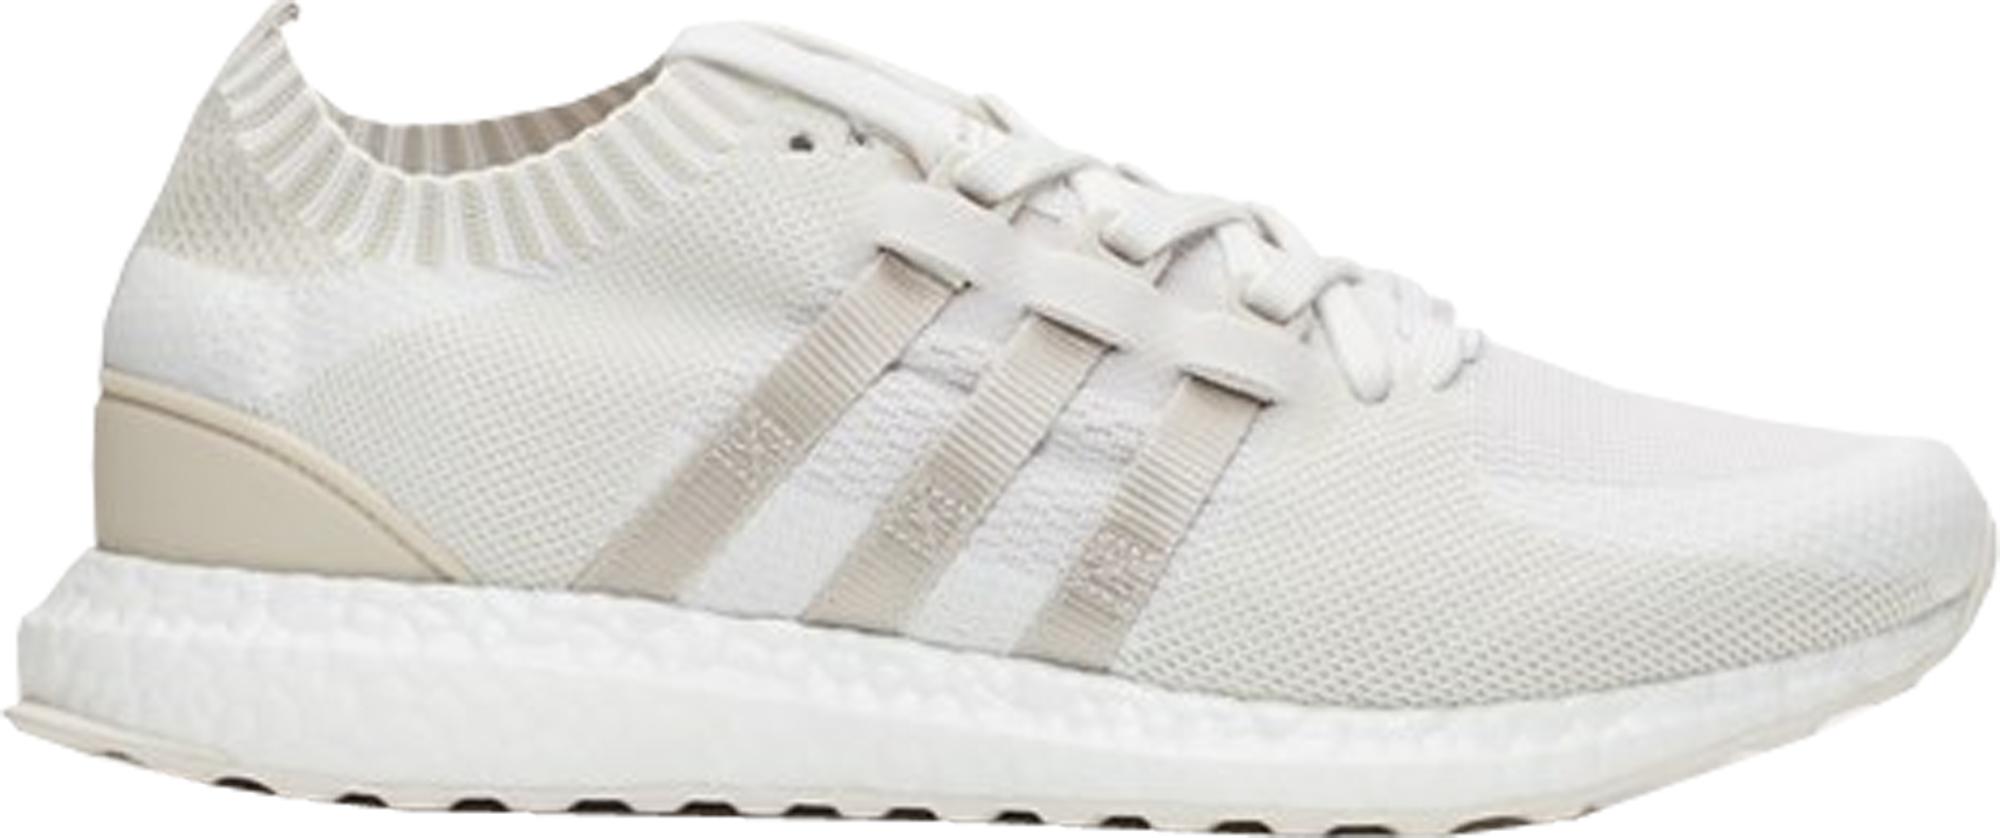 Adidas eqt sostegno ultra primeknit materiali cq1894 bianco